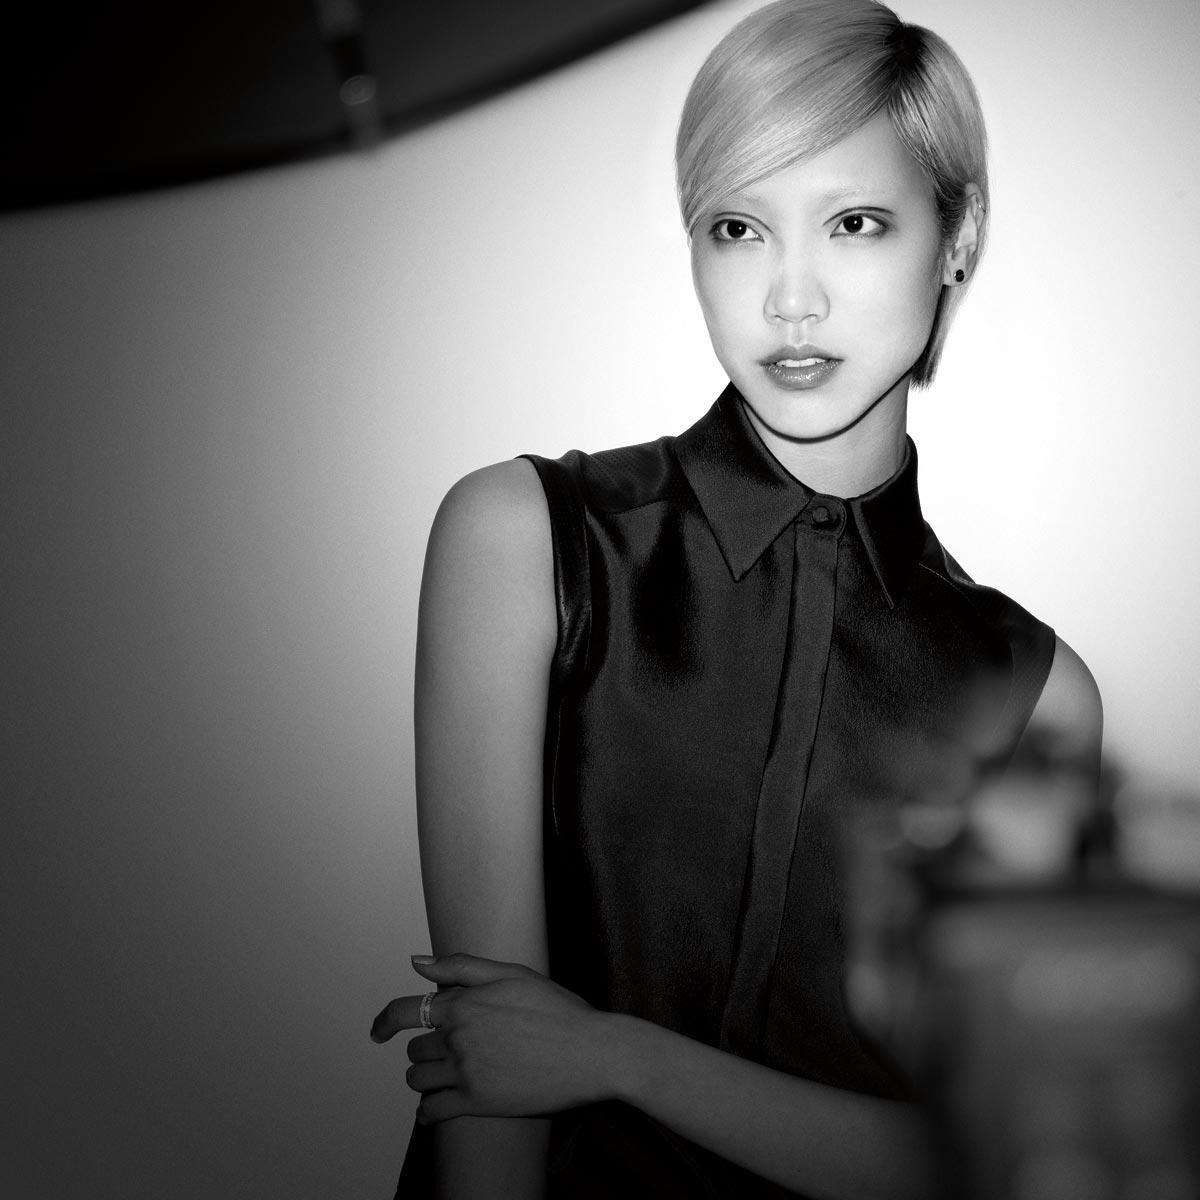 Soo Joo Park je najnovšia múza značky Redken. (Foto: Matt Irwin)